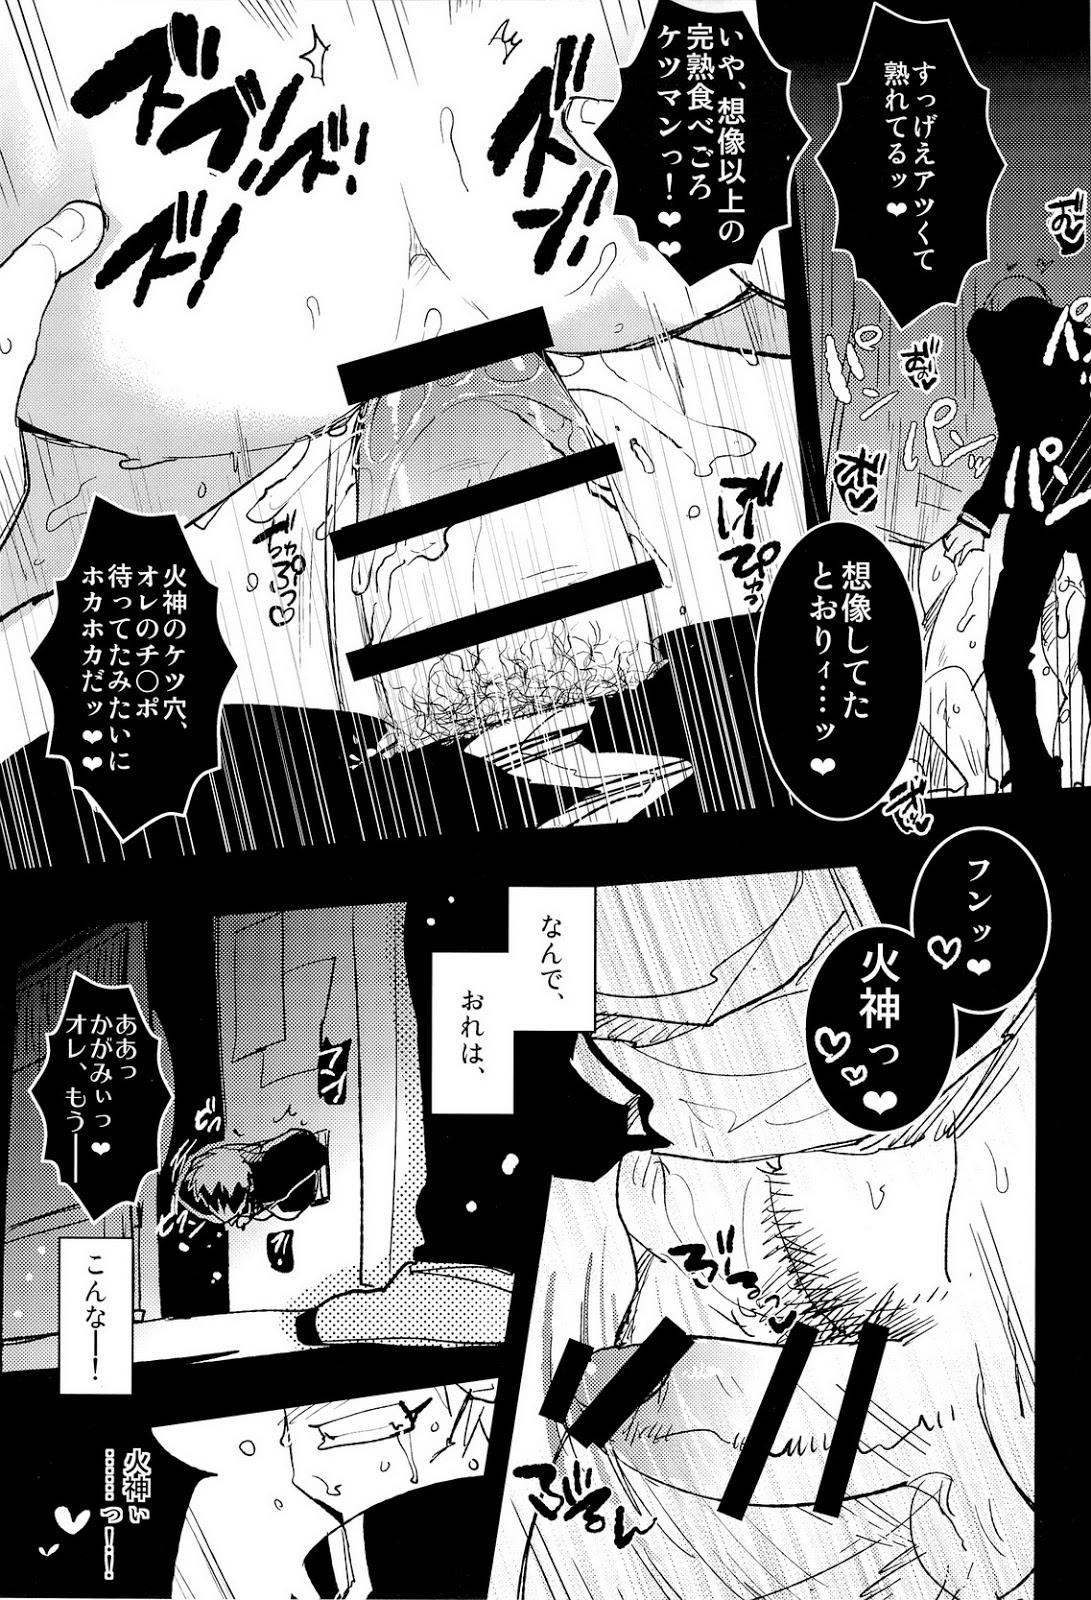 Kabejiri Hon - DK Fuck 12